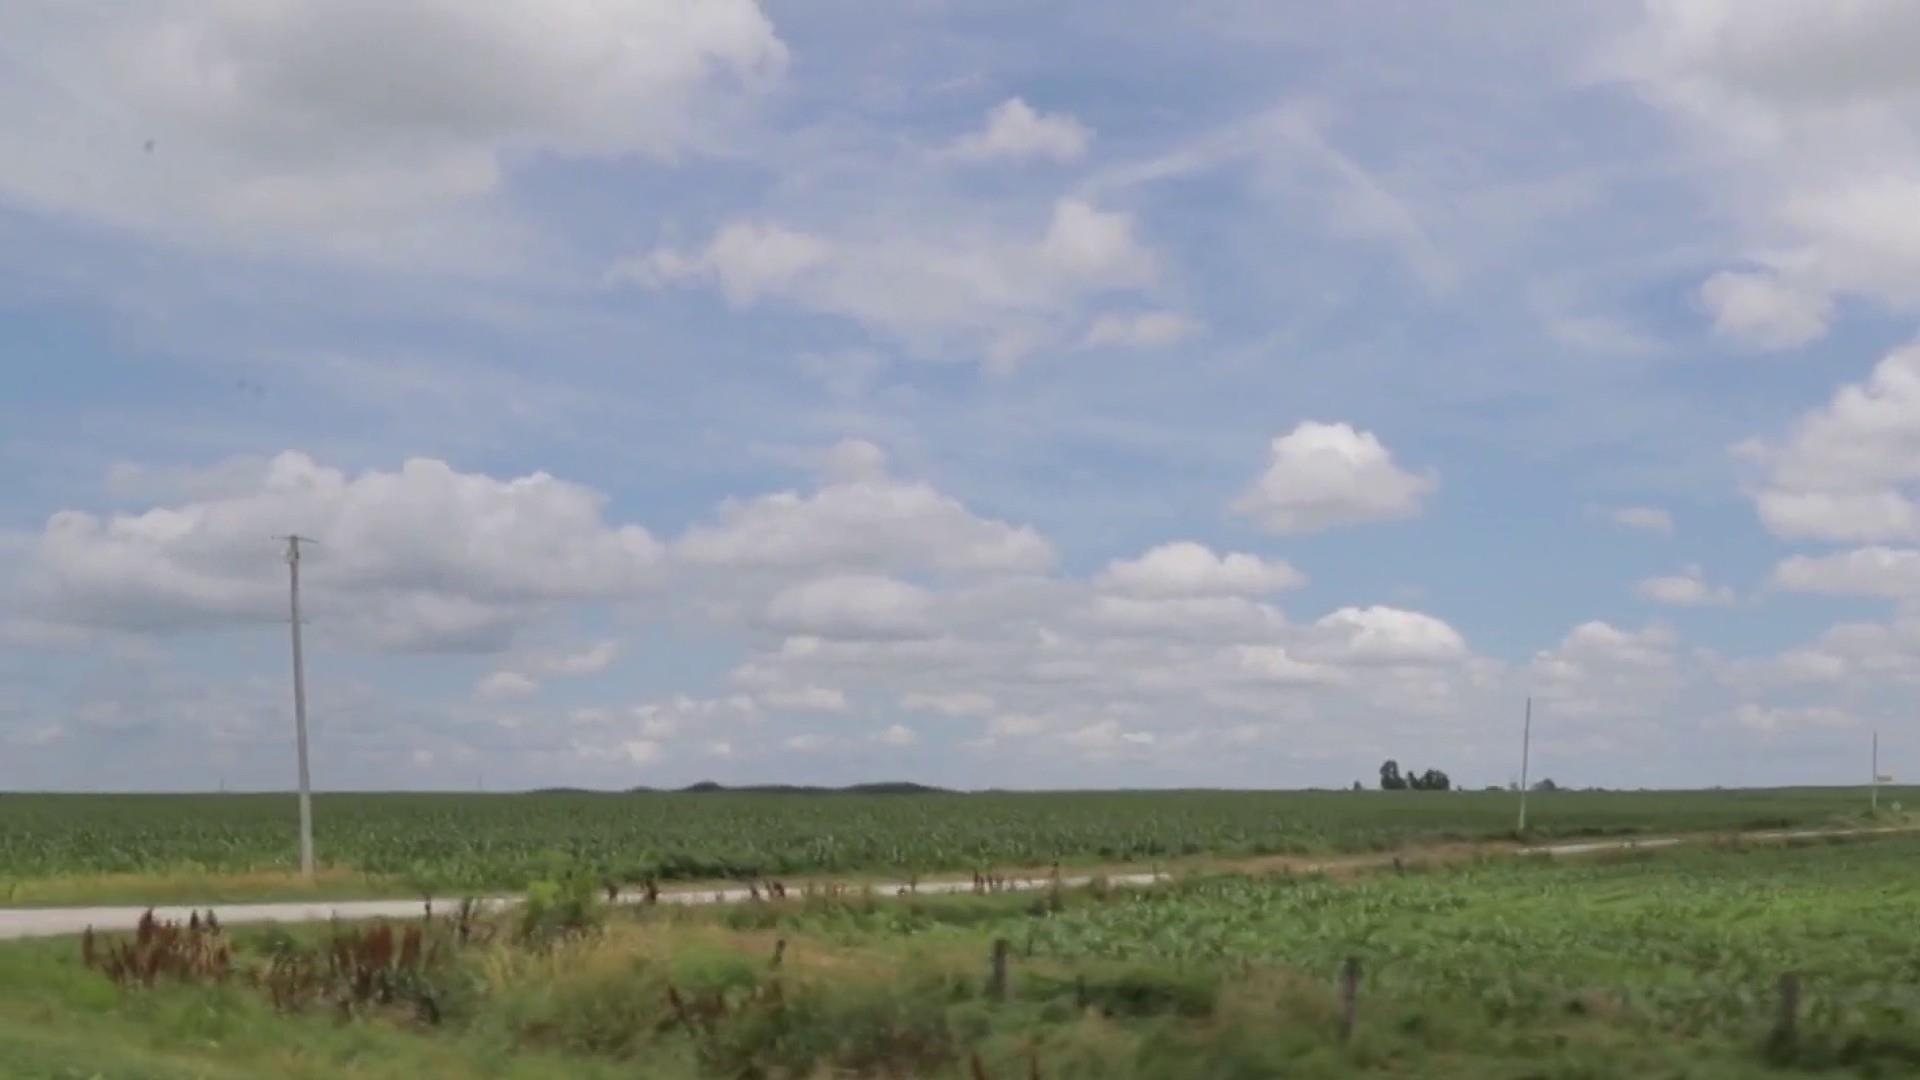 Mark Bittman on how Iowa impacts the food system